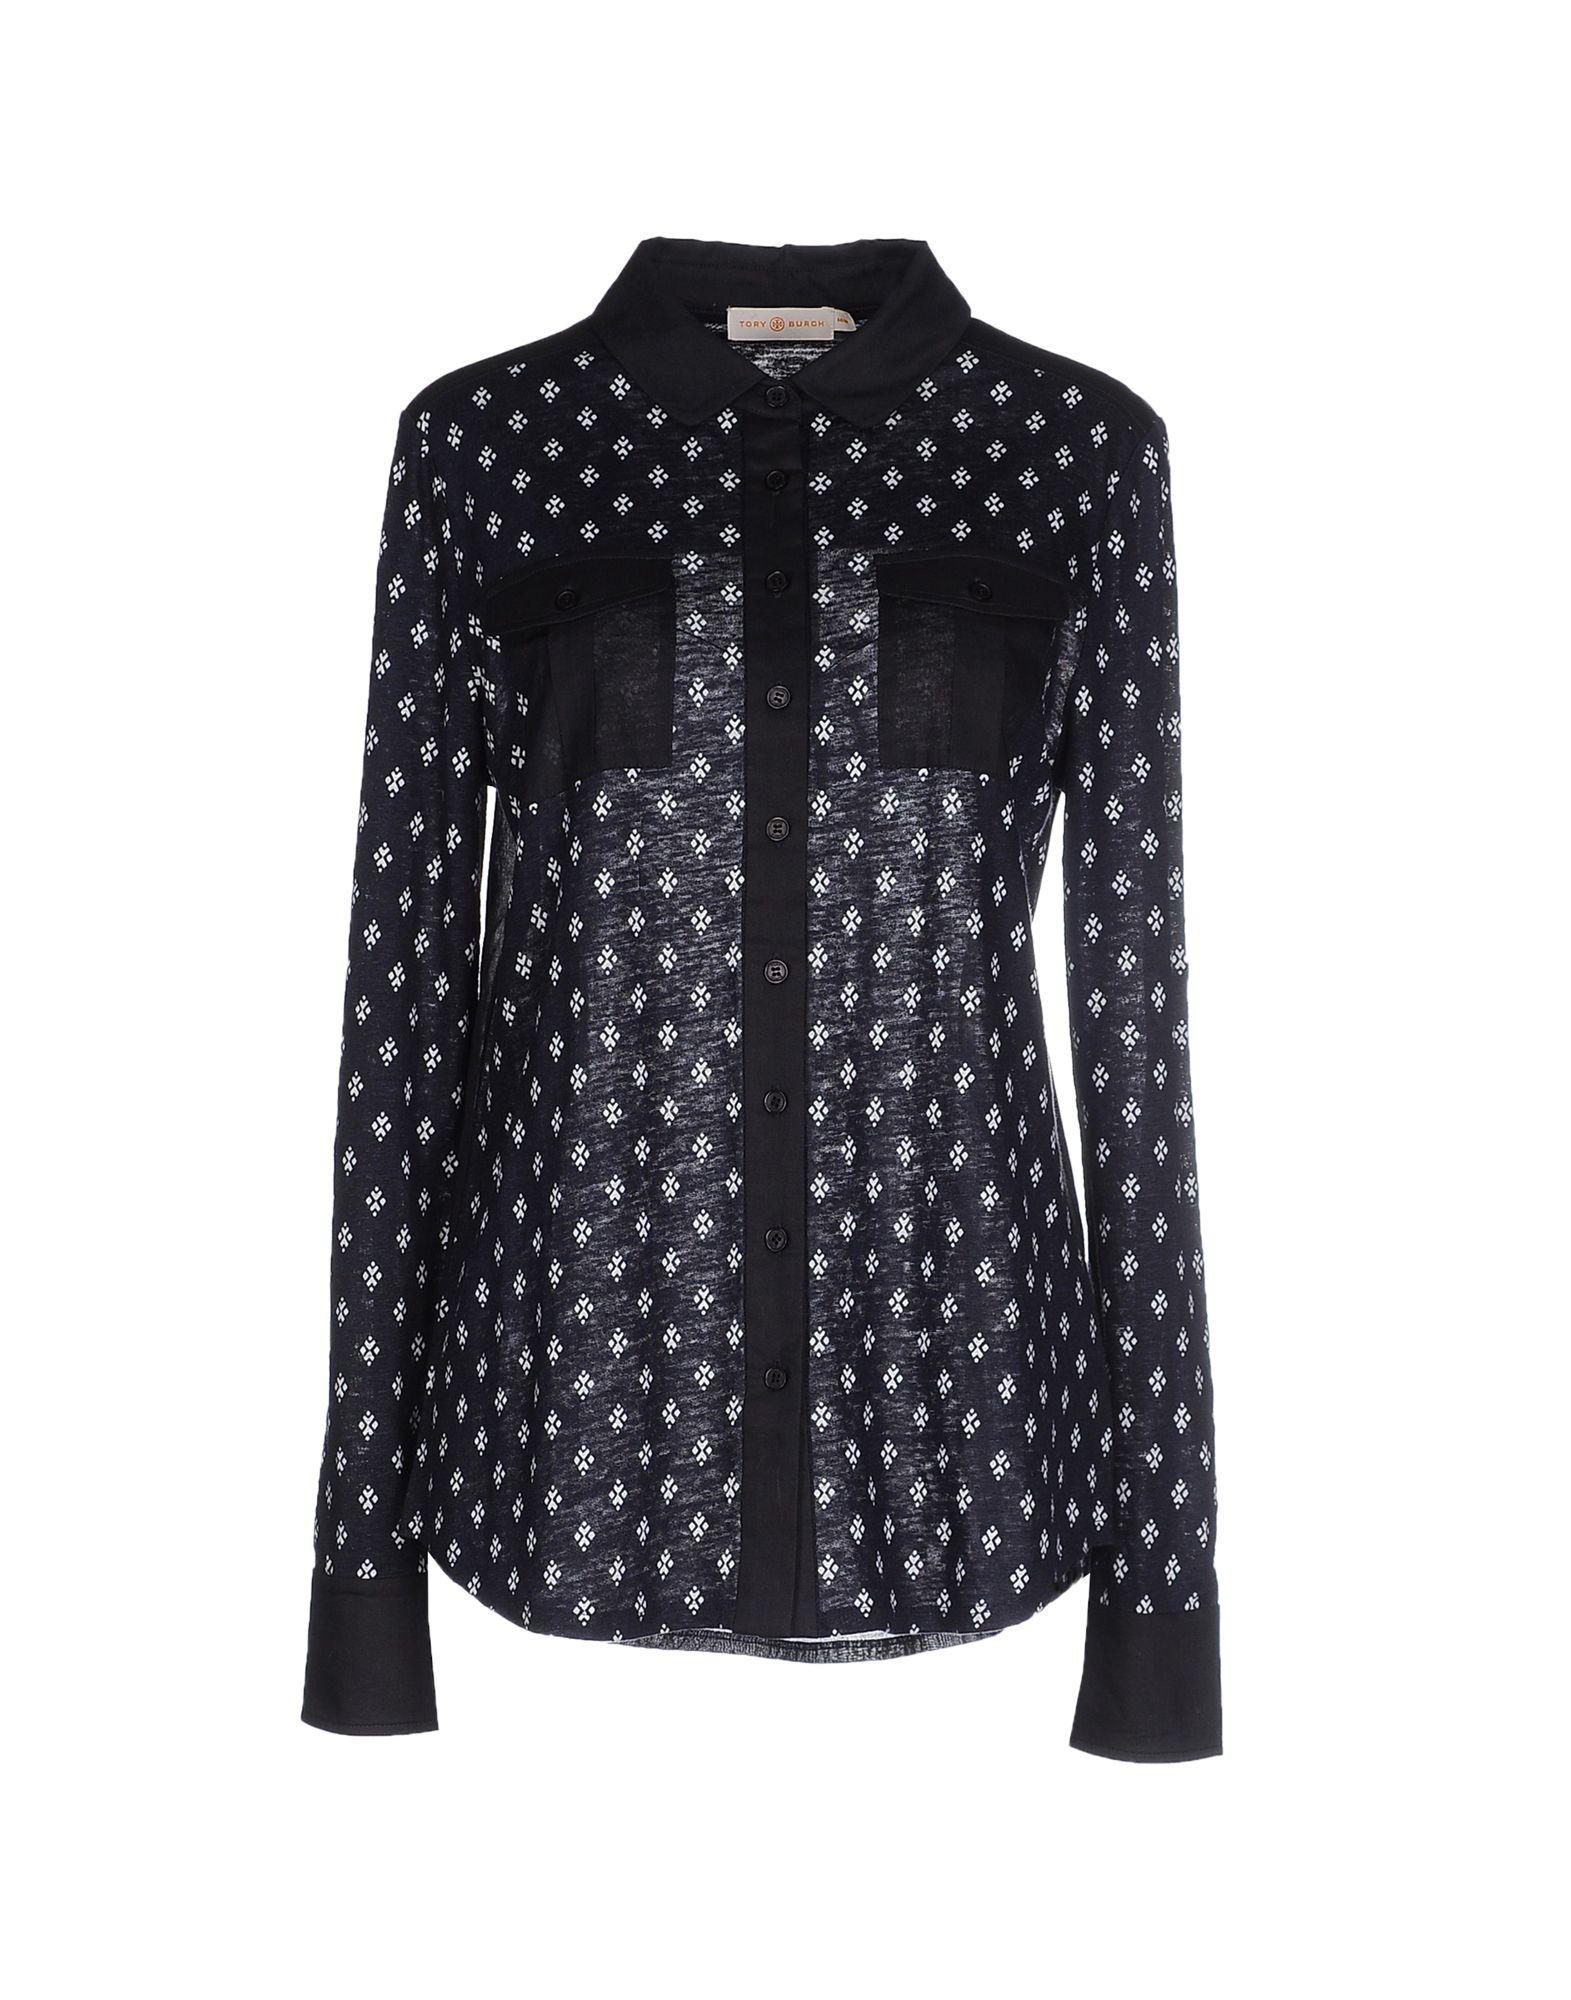 Lyst tory burch finlay button down shirt tory navy for Tory burch button down shirt